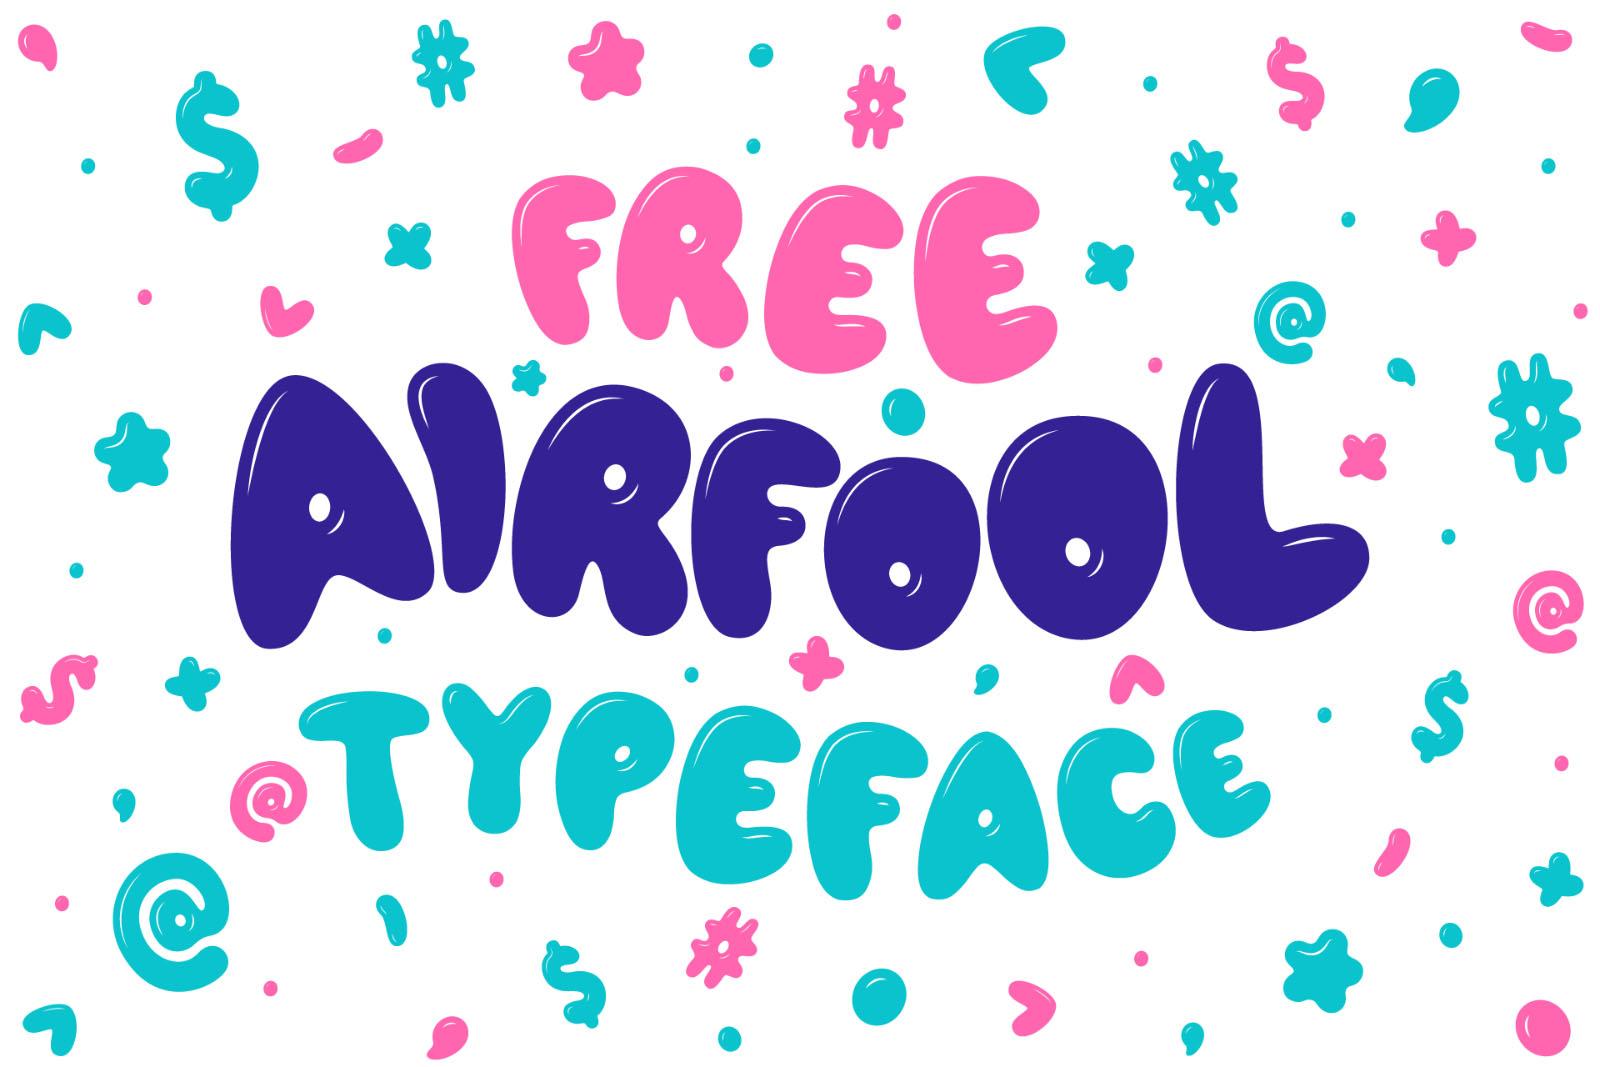 Free Airfool Comic Font